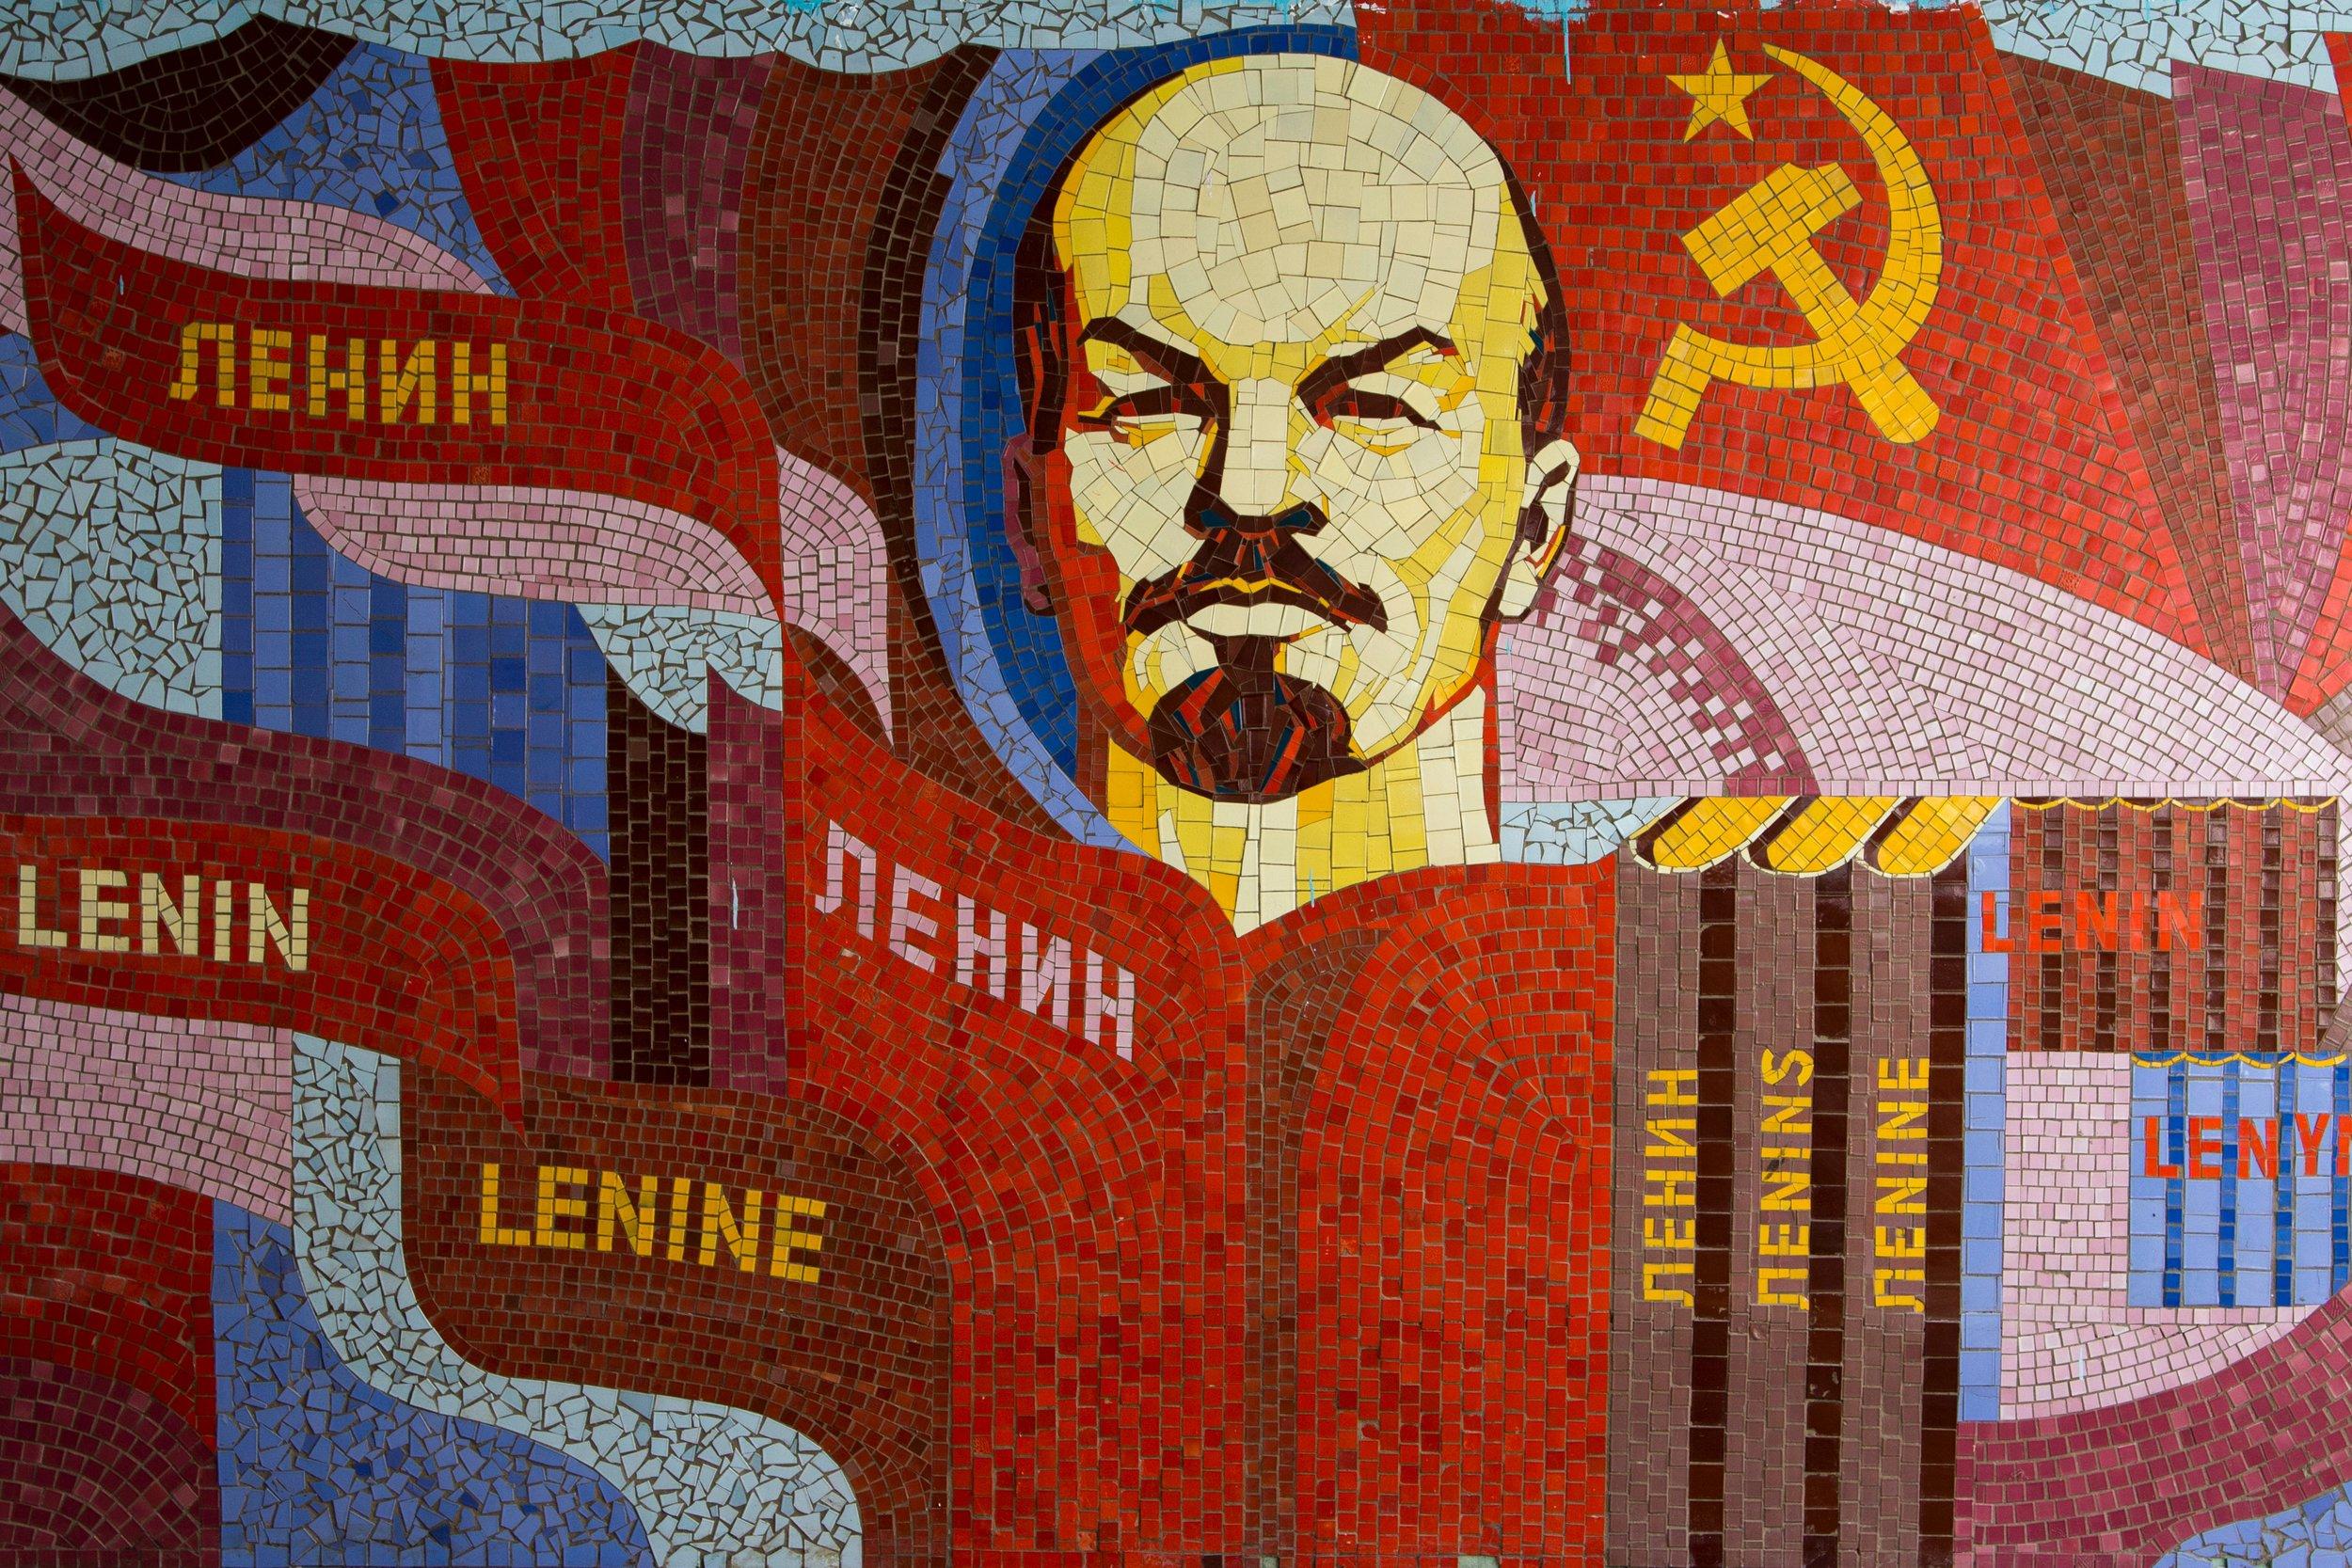 Communism & Historical Memory -